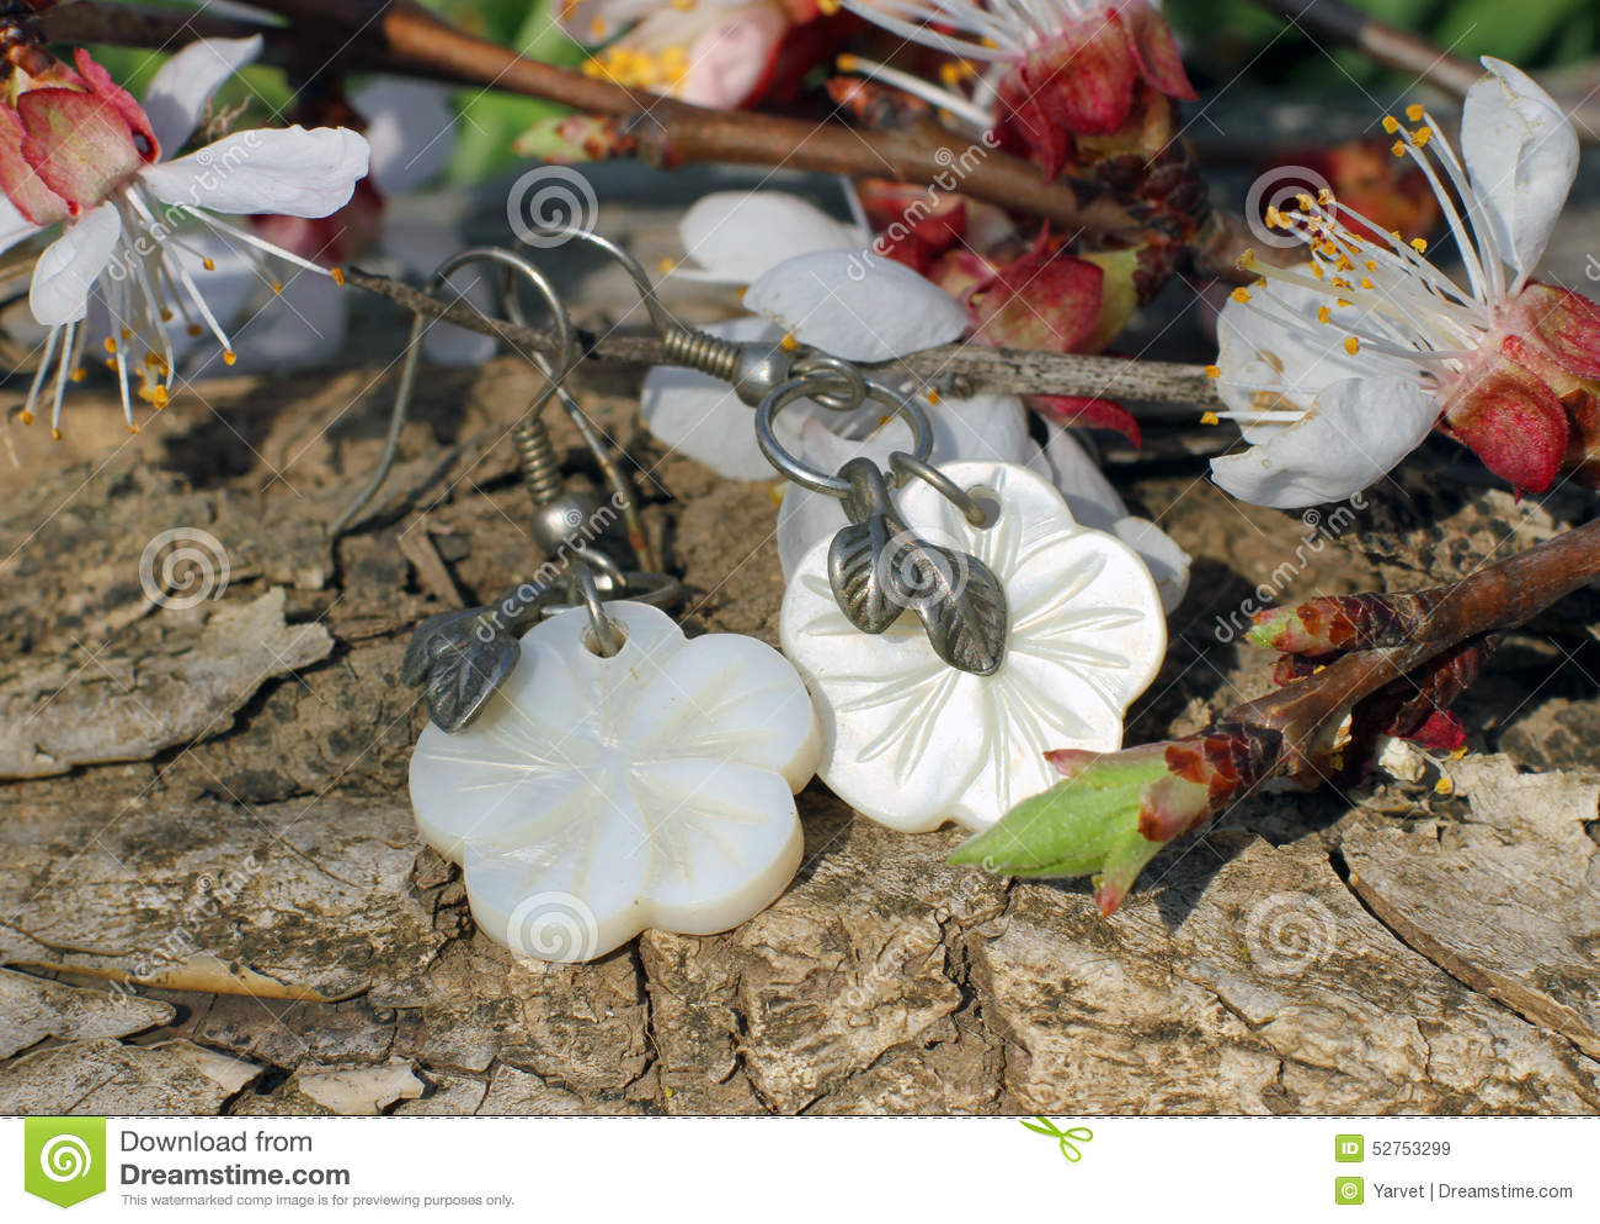 Bone earrings on the nature background